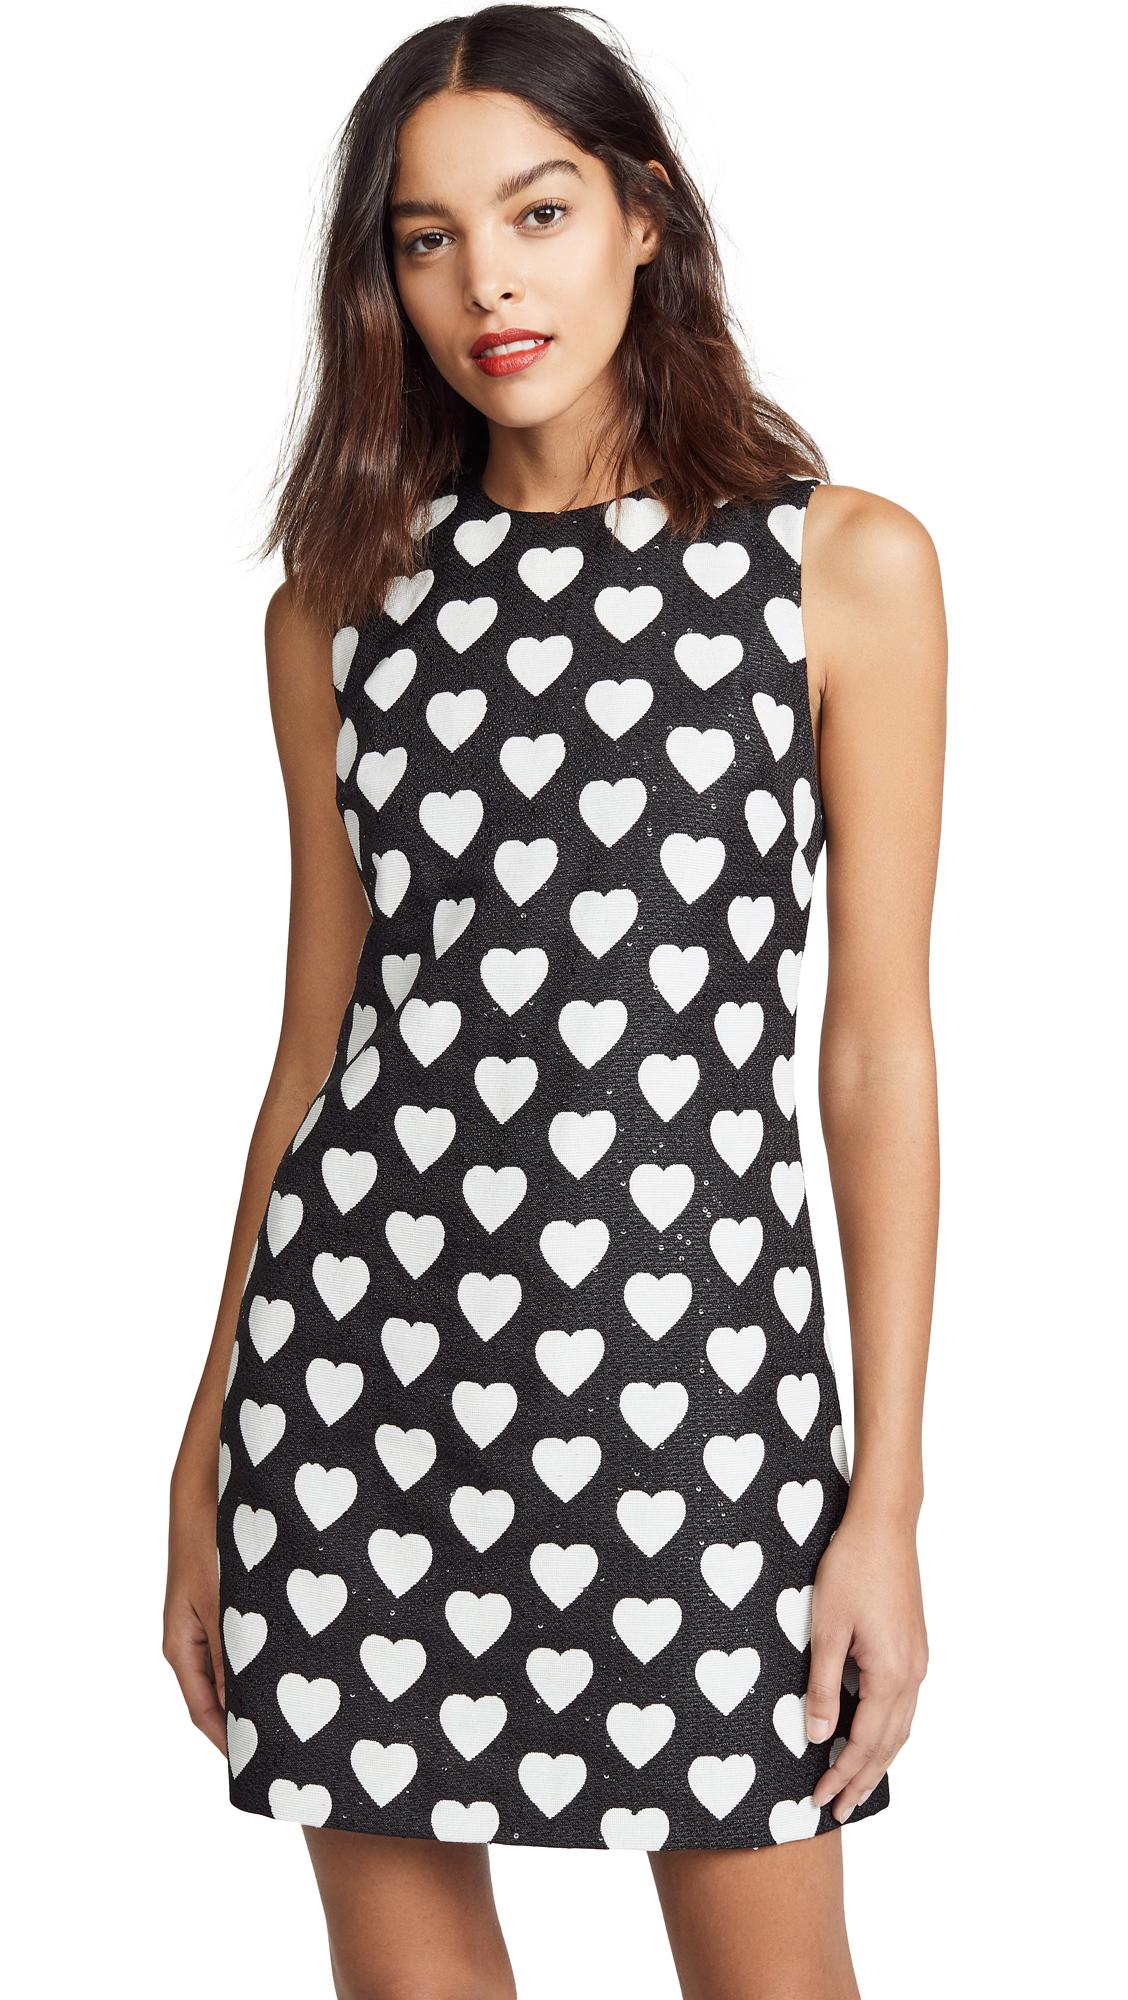 alice + olivia Coley Crew Neck A -Line Dress - Black/White